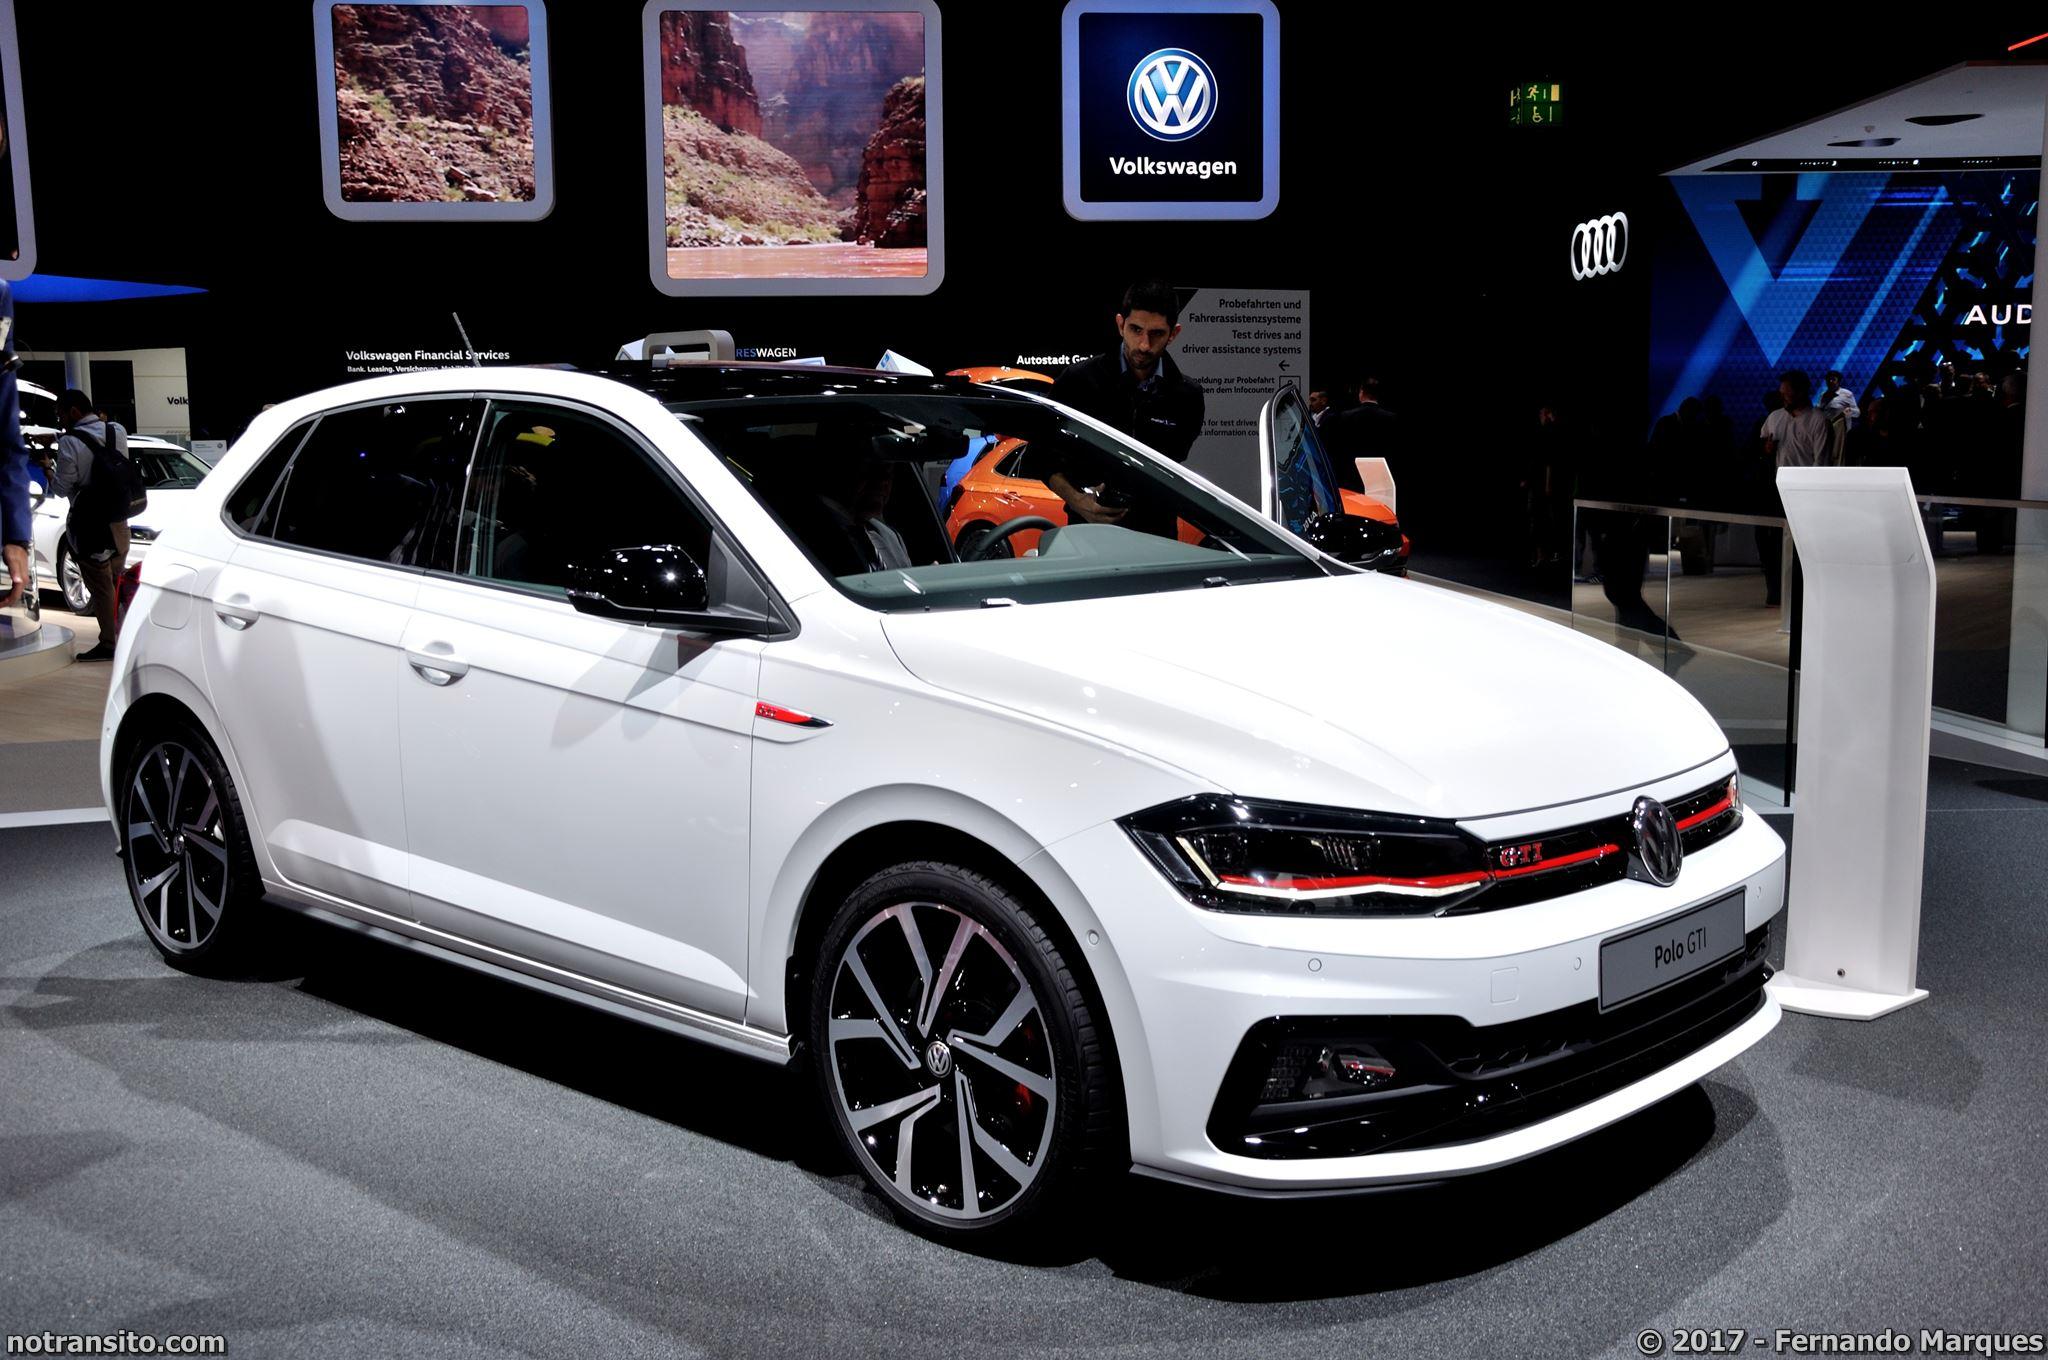 Volkswagen-Polo-GTI-Frankfurt-2017-006